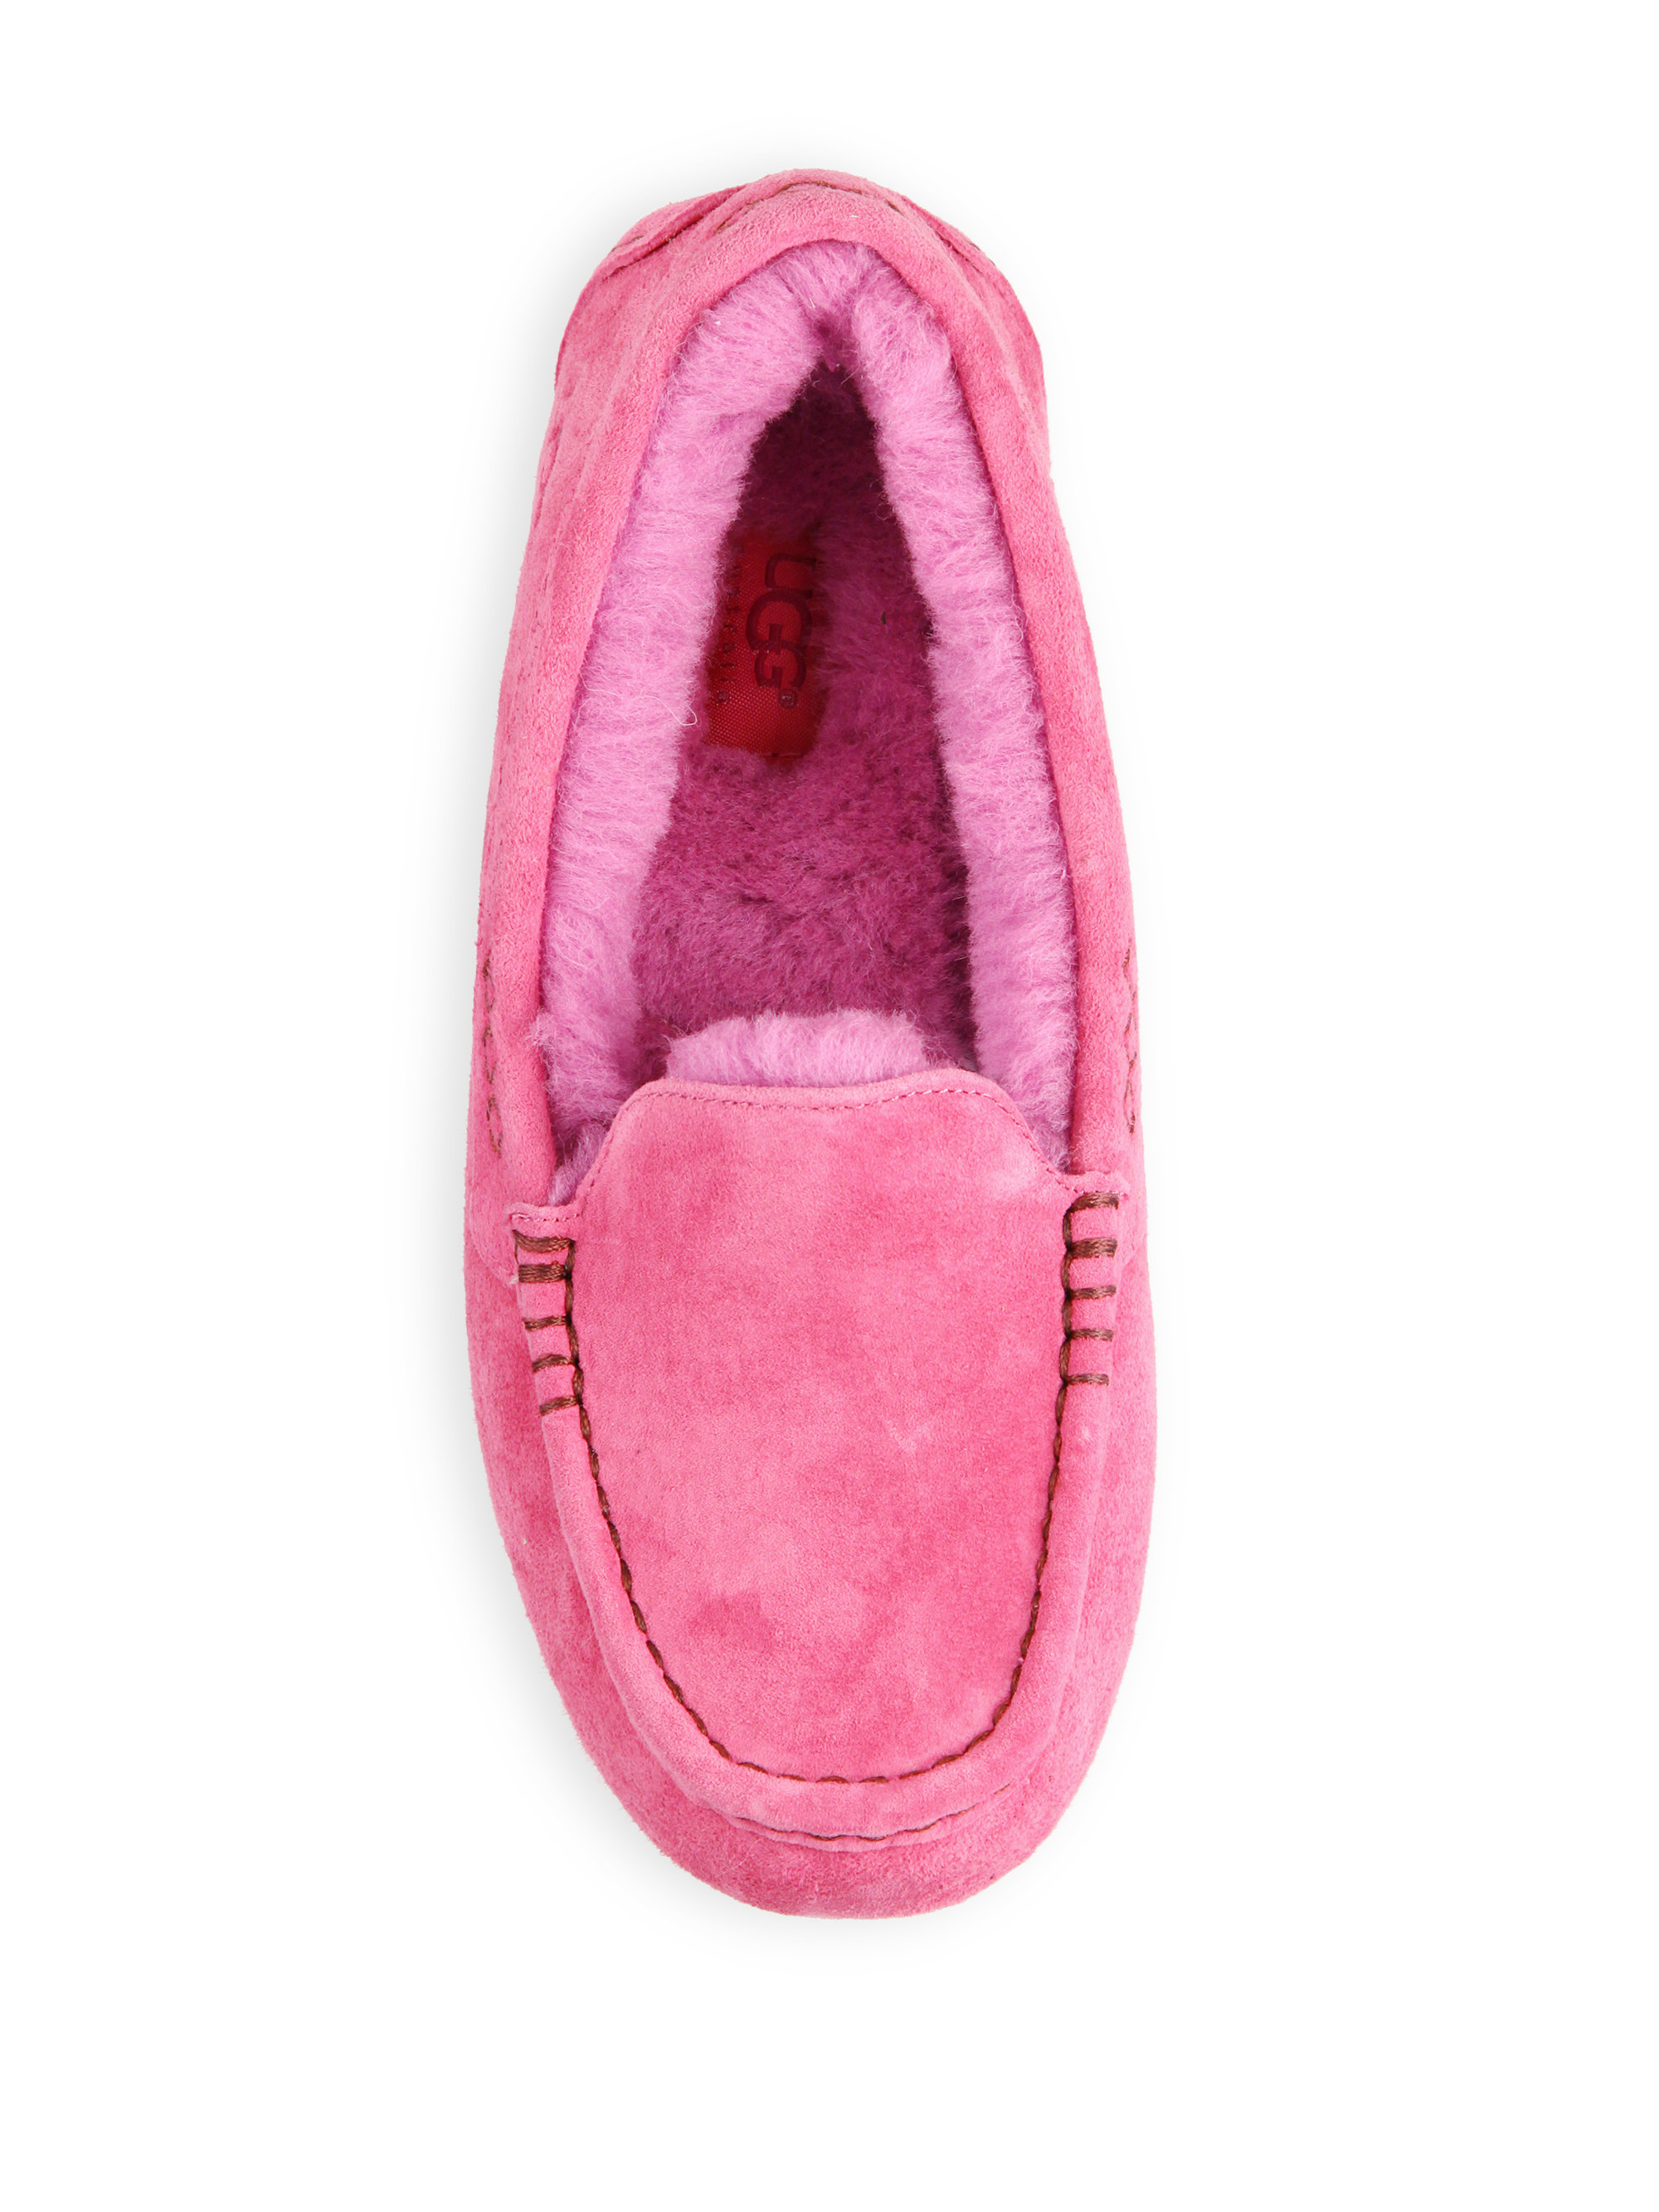 ugg slippers purple